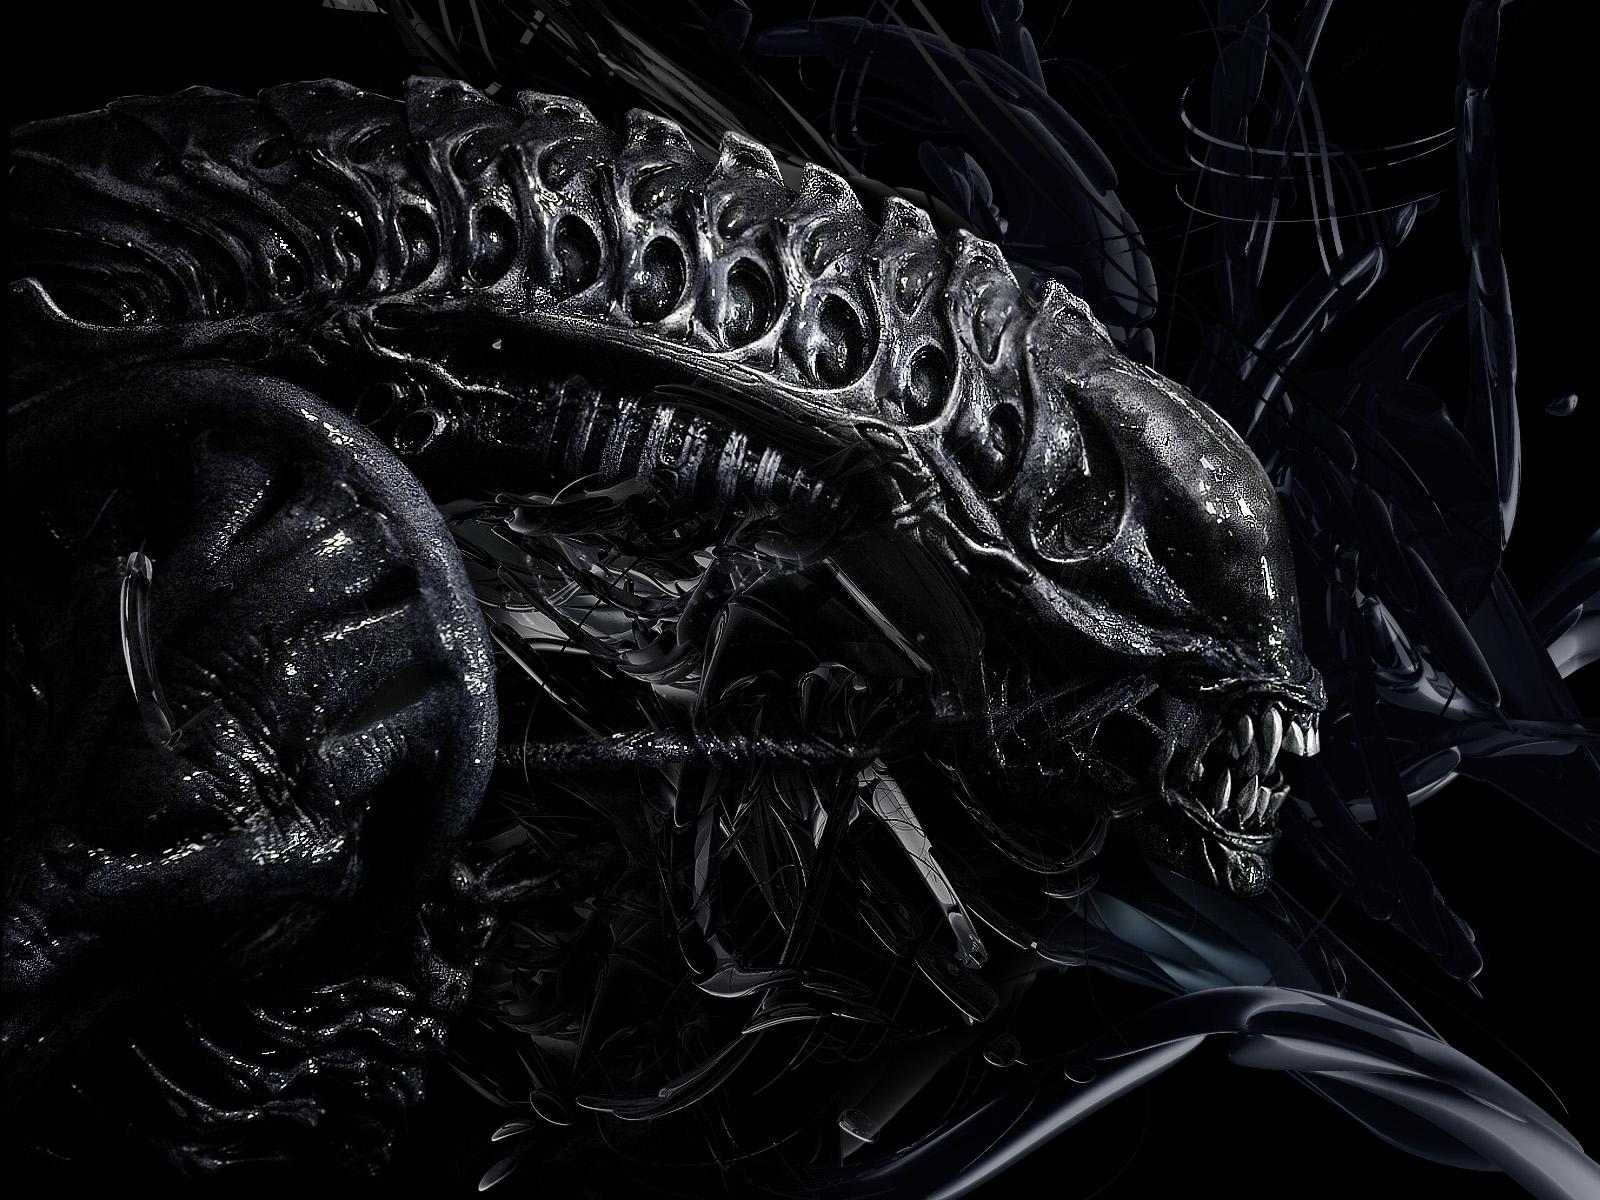 Prometheus Pre-Game – Glenn Walker Revisits Alien 3 | Biff ... H.r. Giger Tattoo